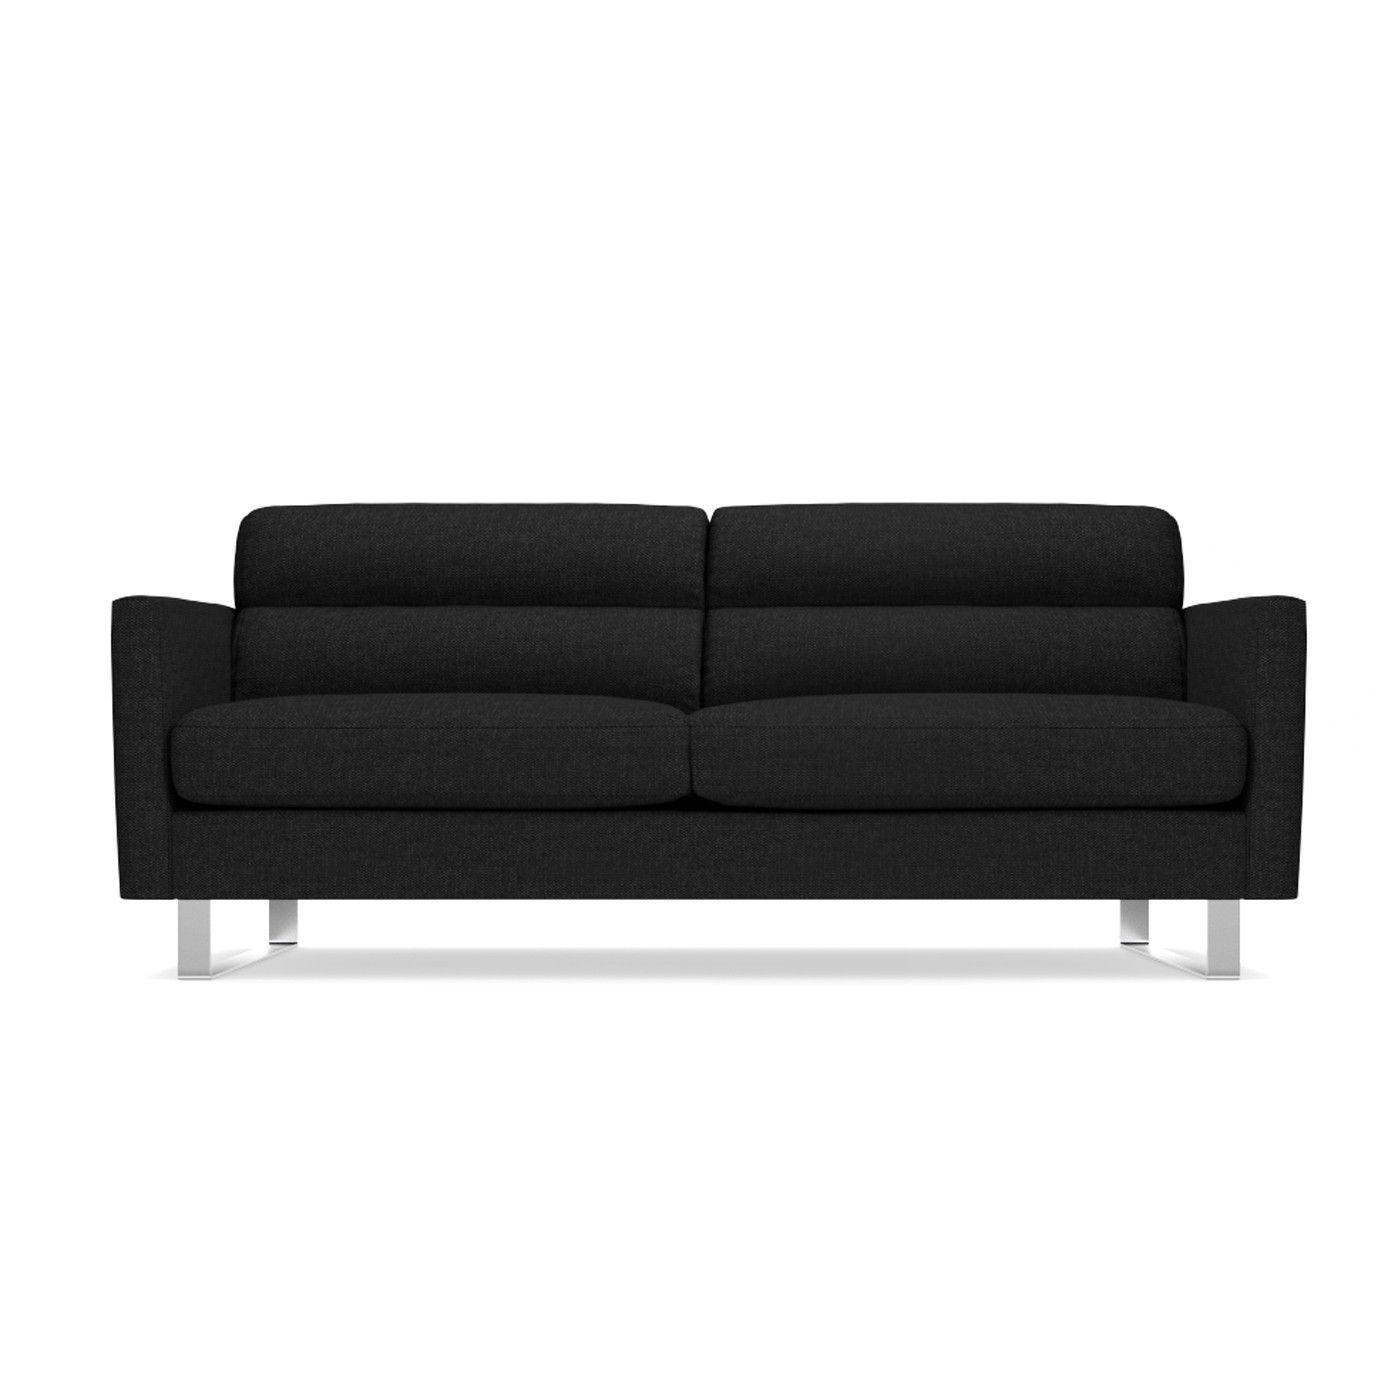 Savannah Eco Friendly Sofa